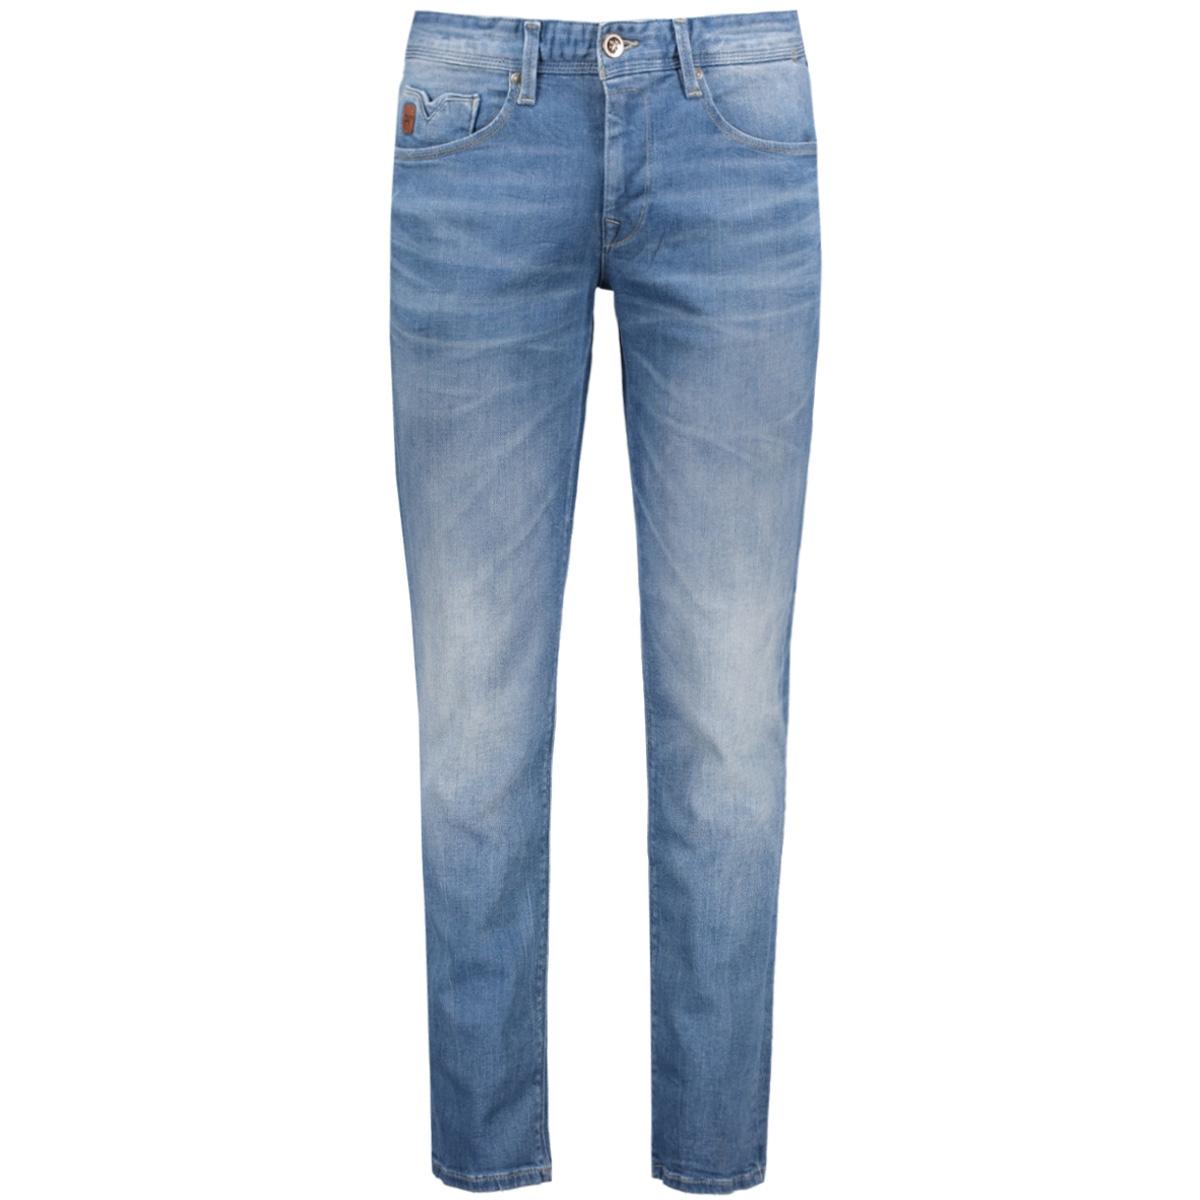 vtr515-cbw vanguard jeans cbw